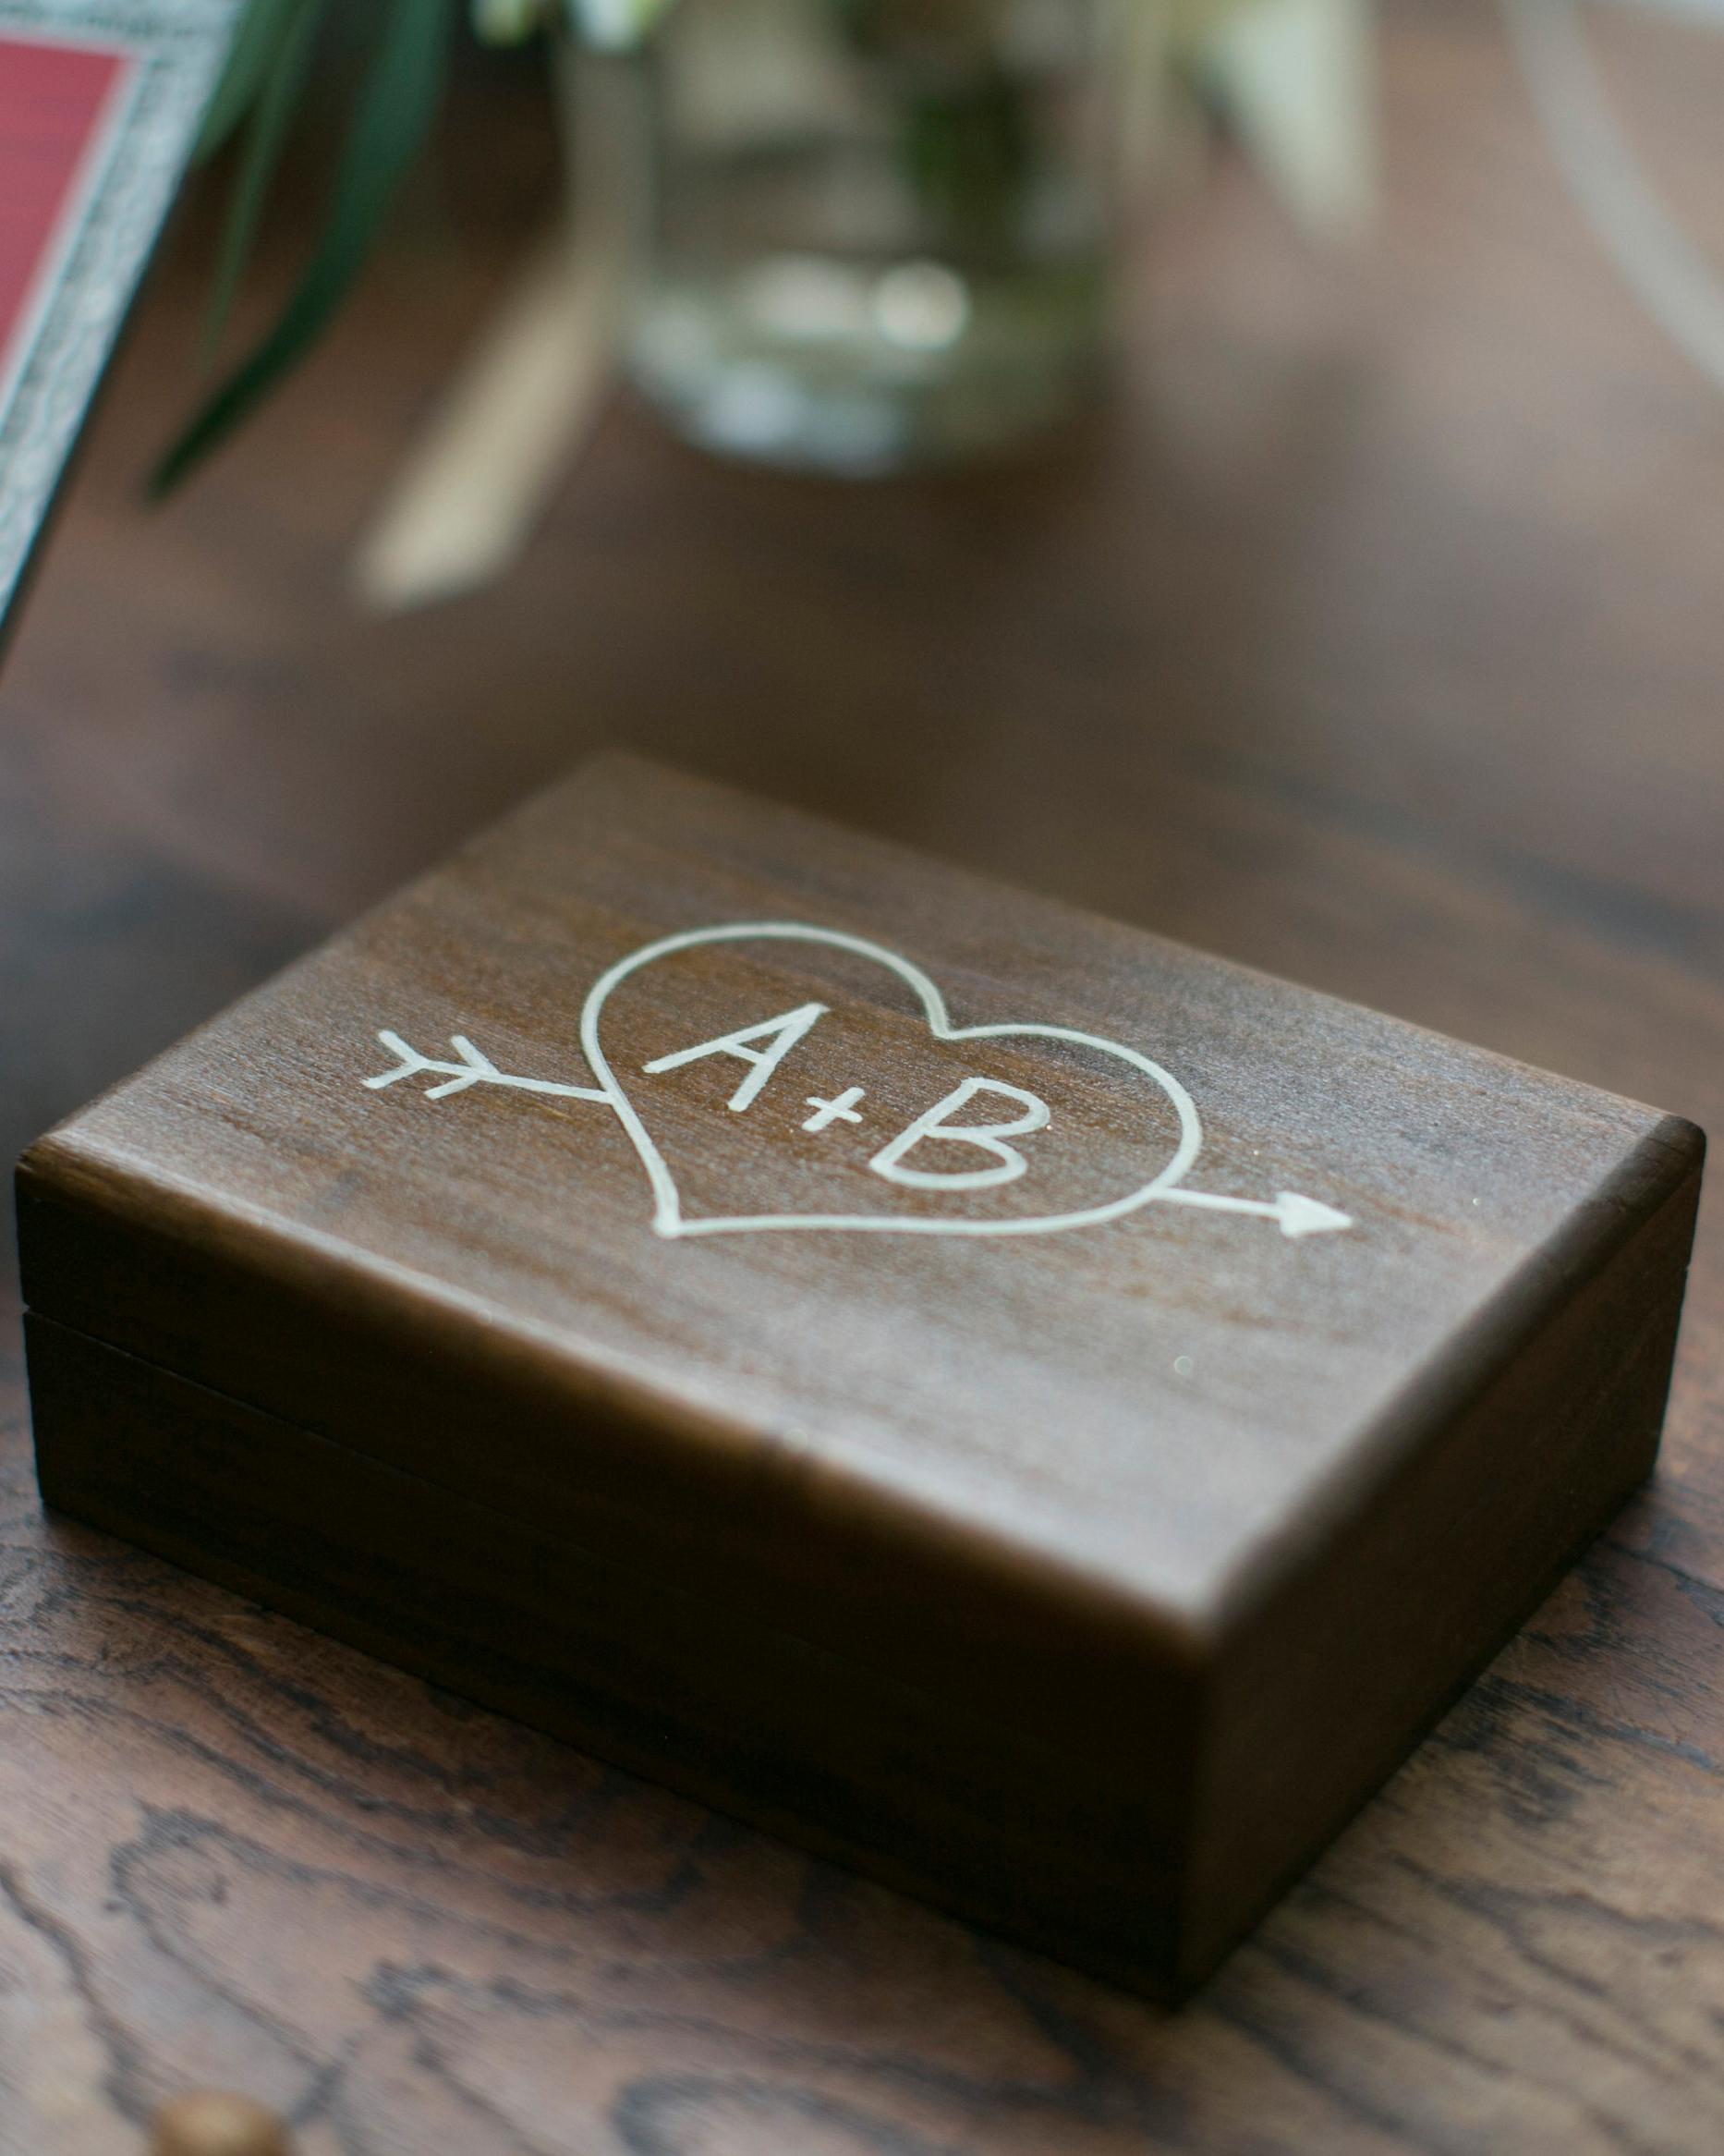 briana-adam-wedding-box-1311-s112471-1215.jpg